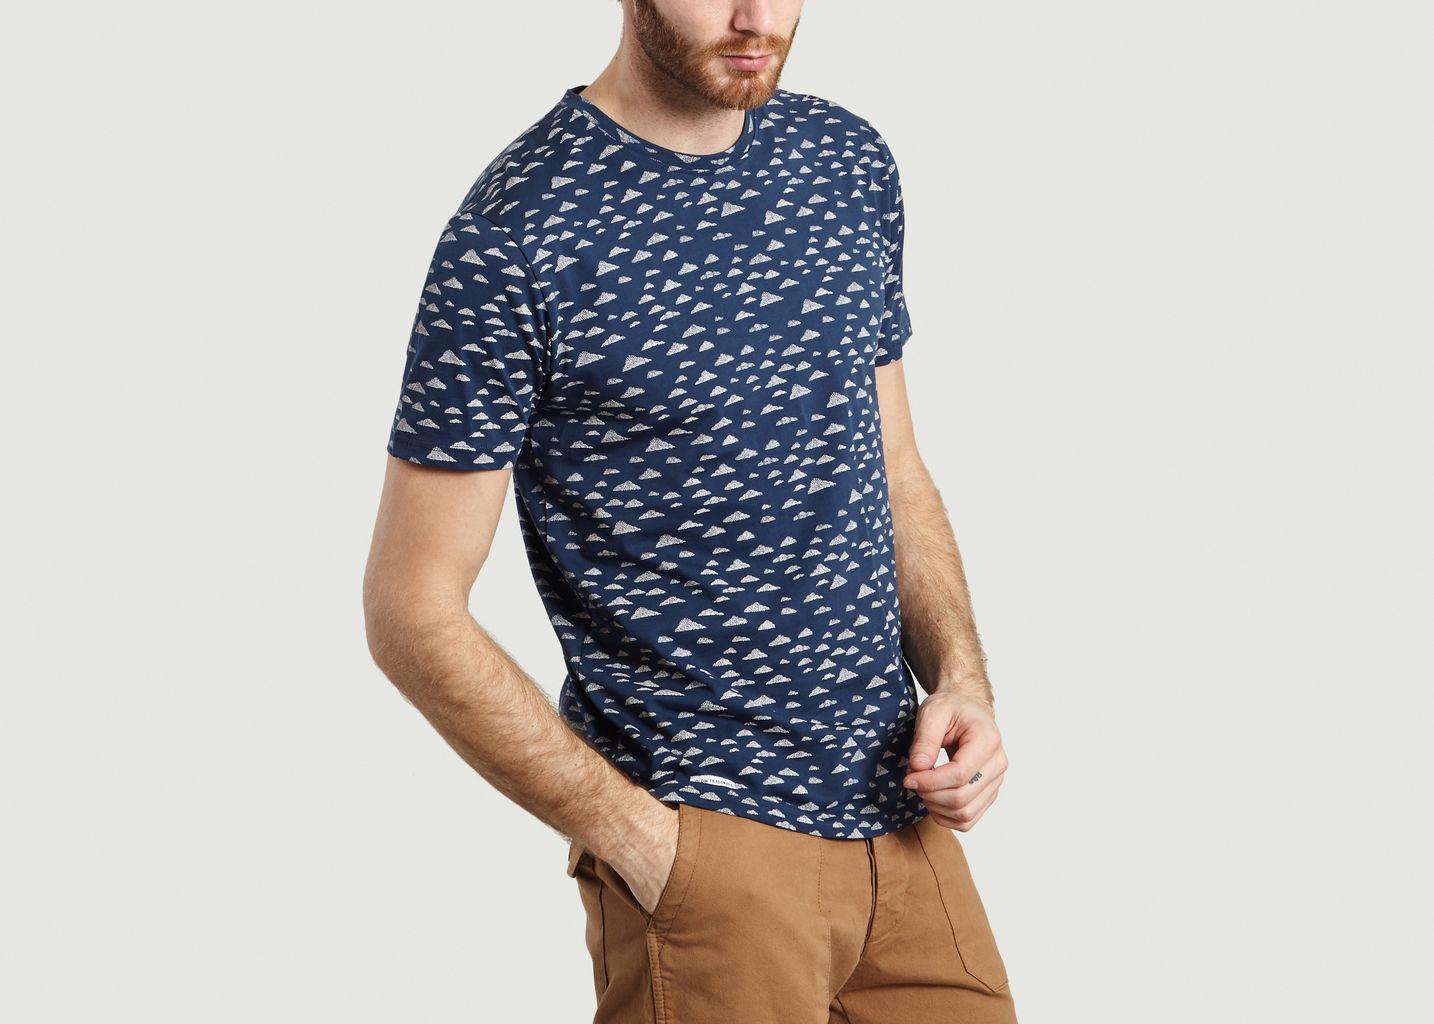 T-Shirt Dreams  - Olow